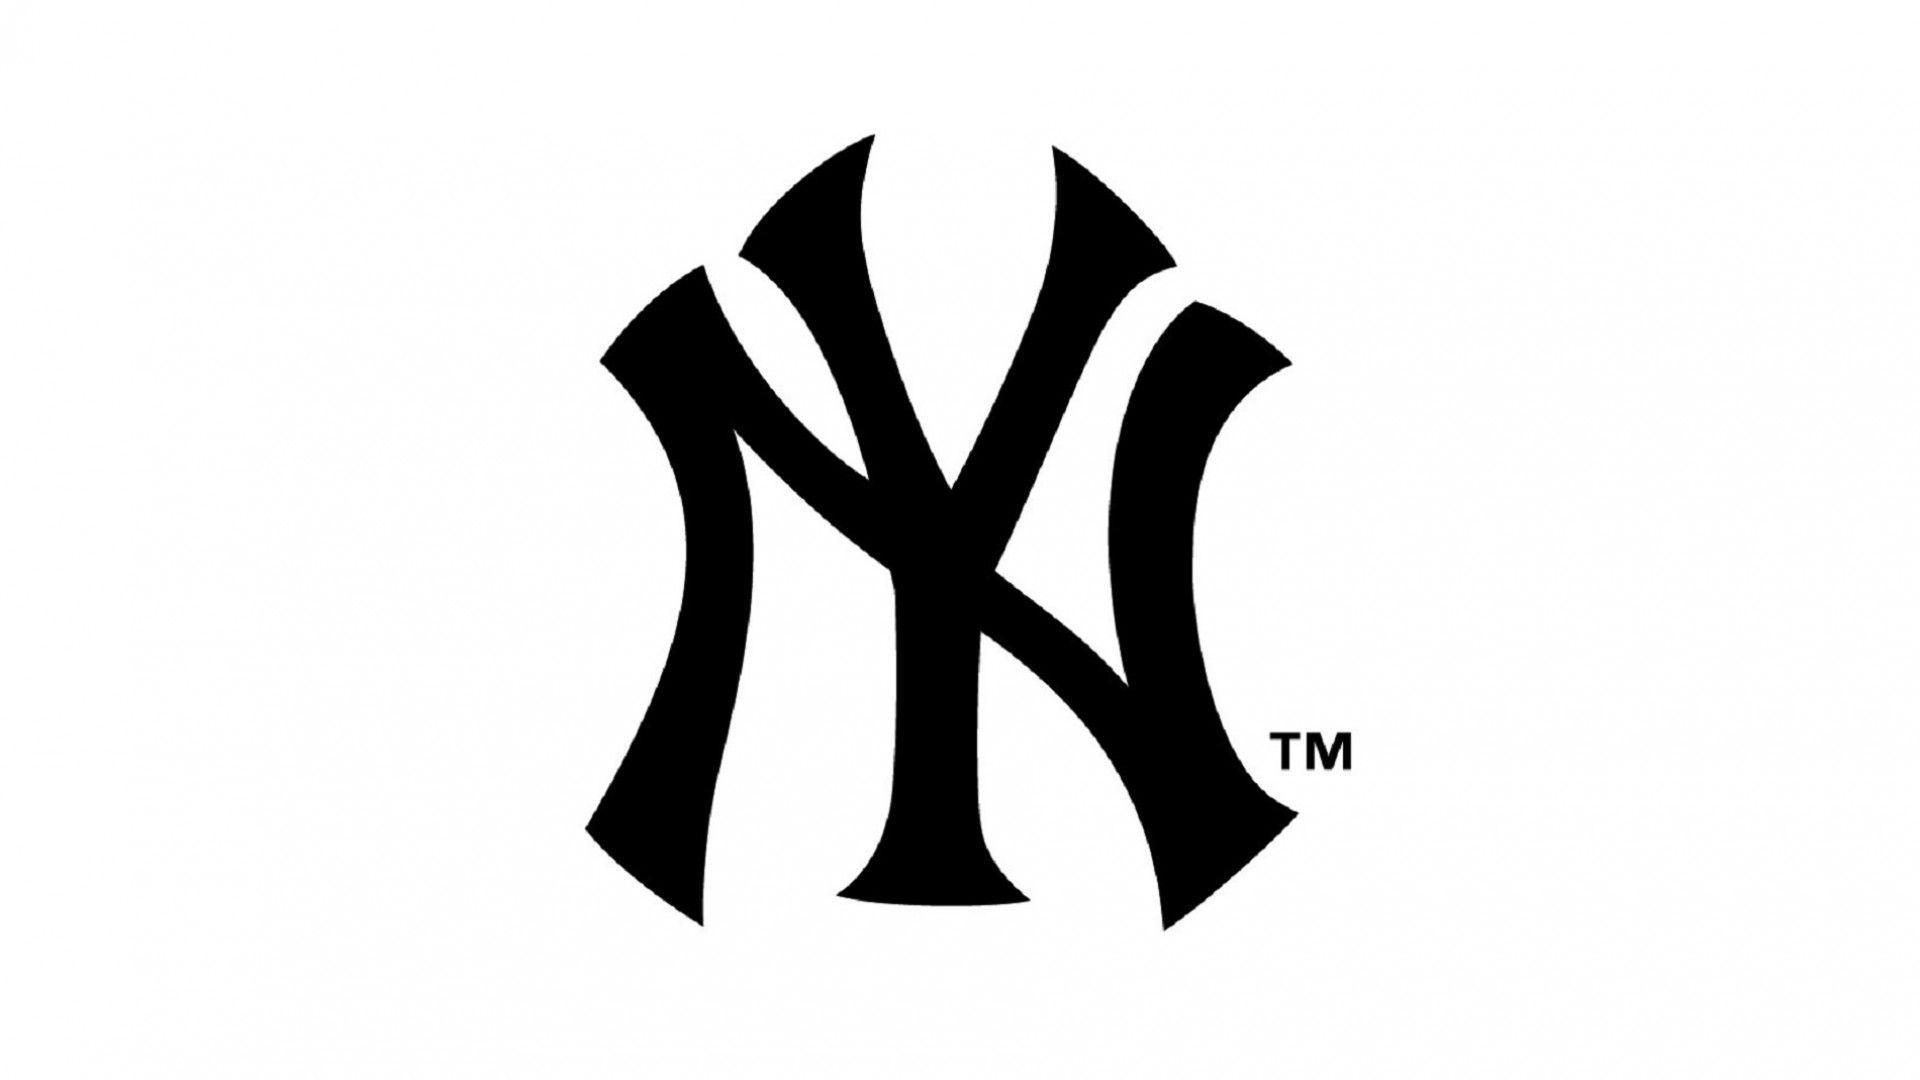 Famous New York Yankees New York Yankees Logo Famous Brand New York Yankees Logo Yankees Logo Ny Yankees Logo